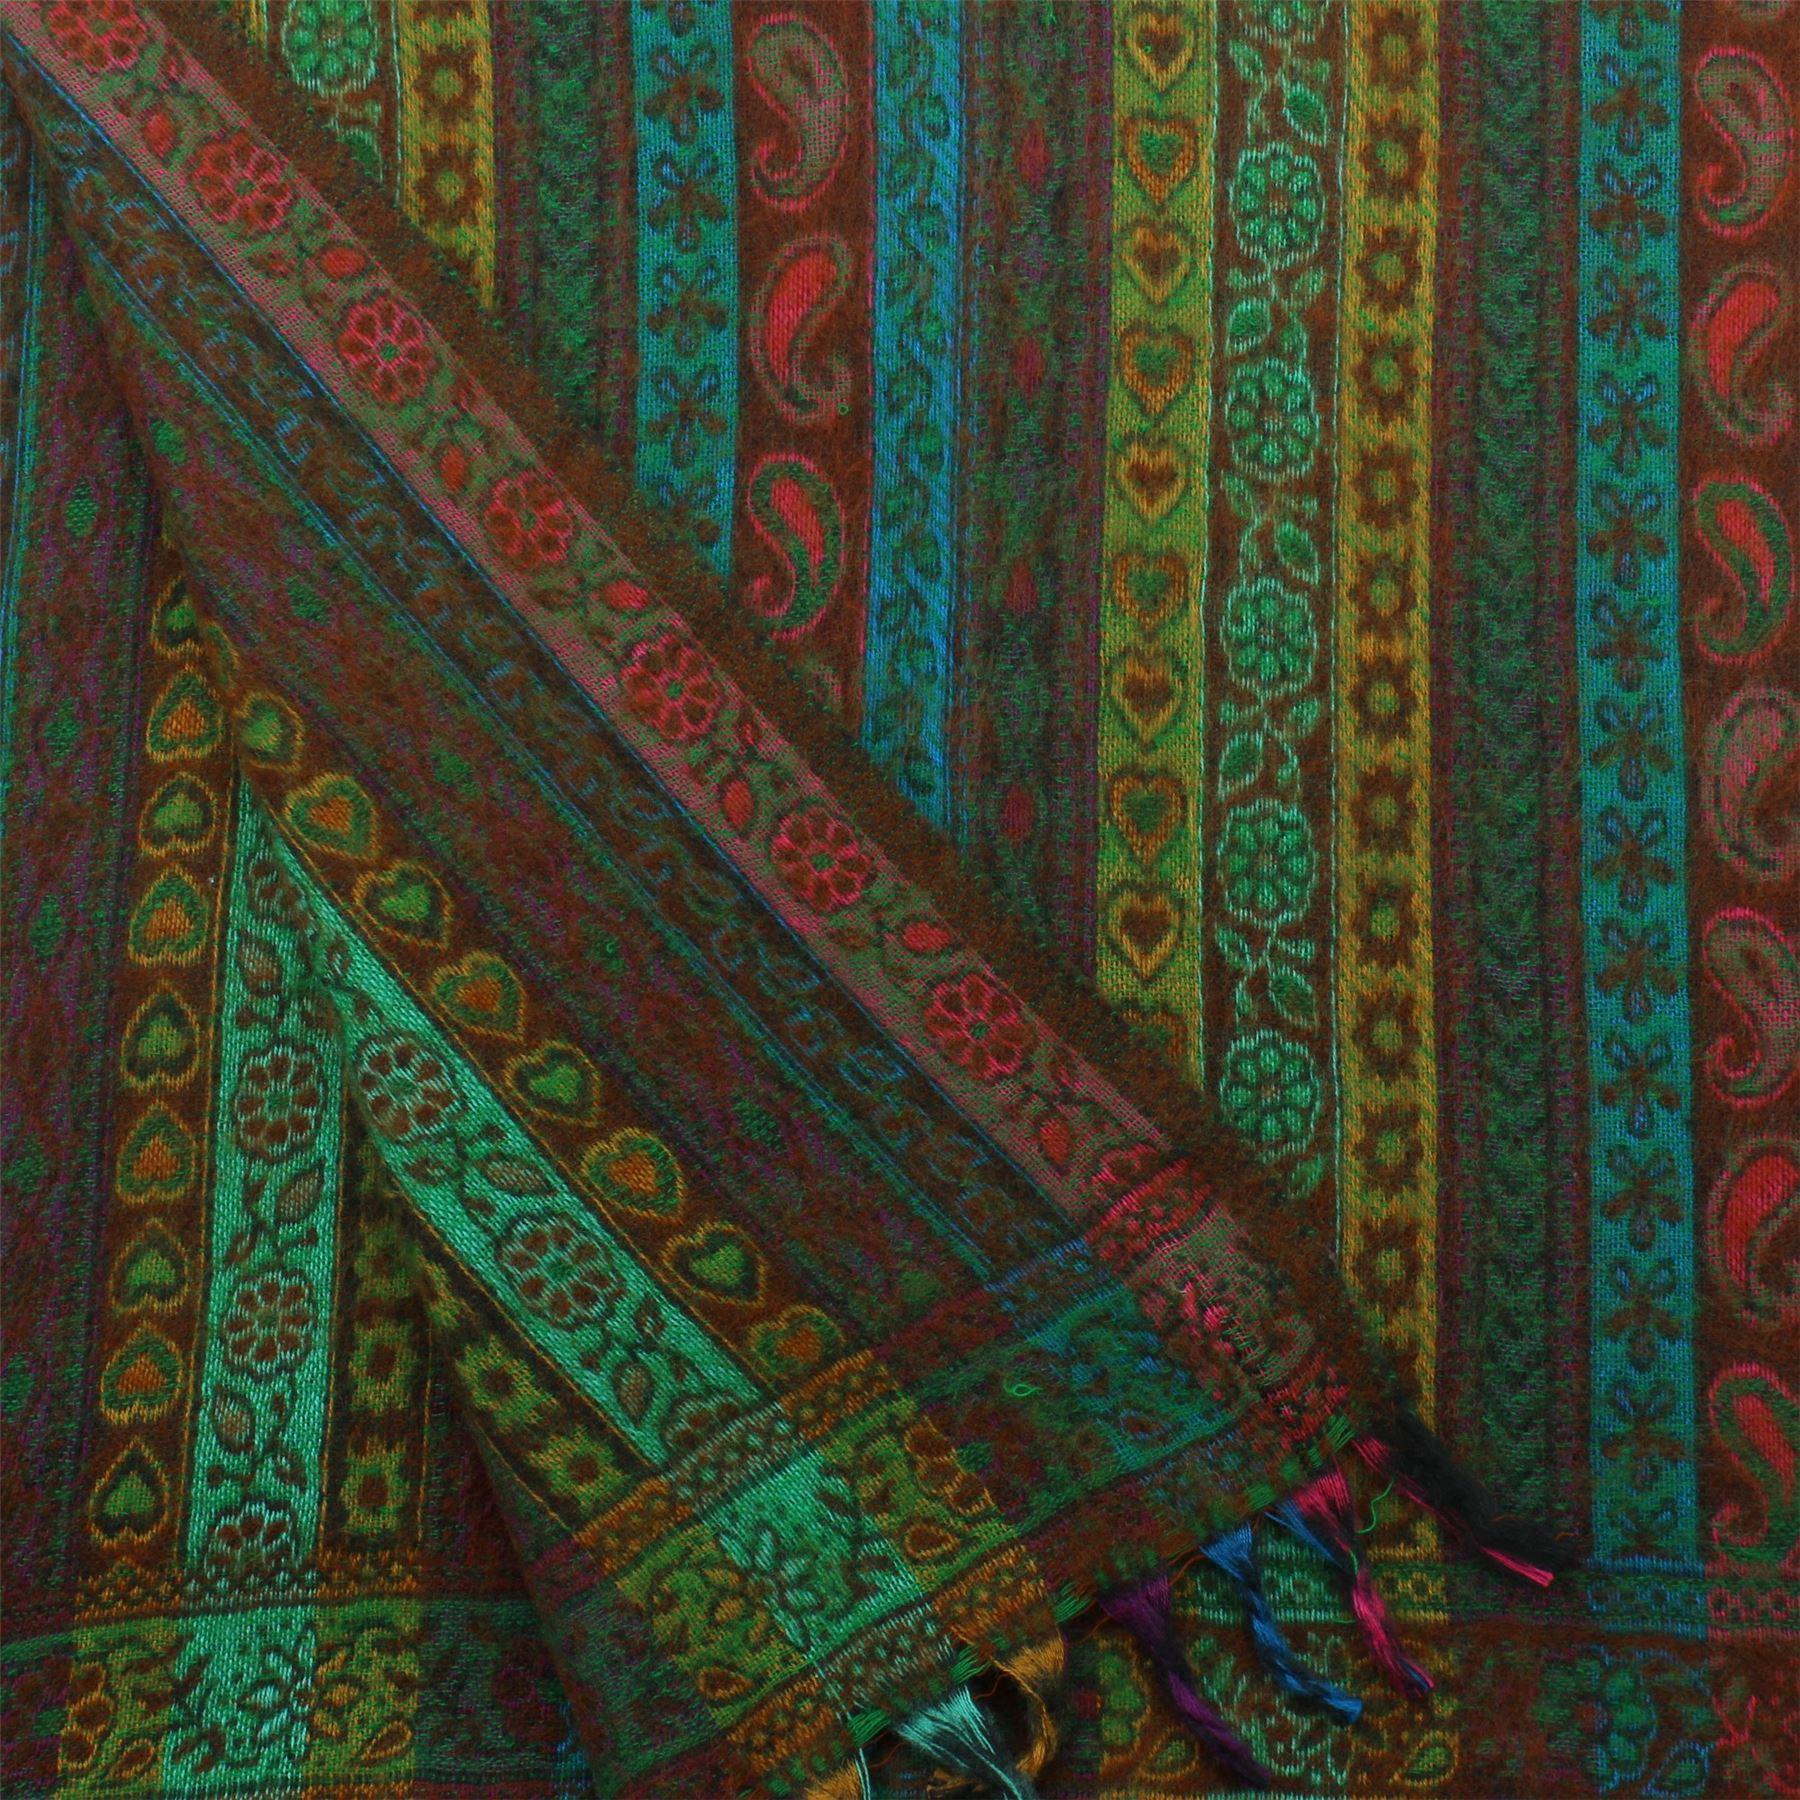 Acrylic-Wool-Blanket-Shawl-Wrap-Throw-Finest-Softest-India-Stripe-Paisley-Travel thumbnail 18